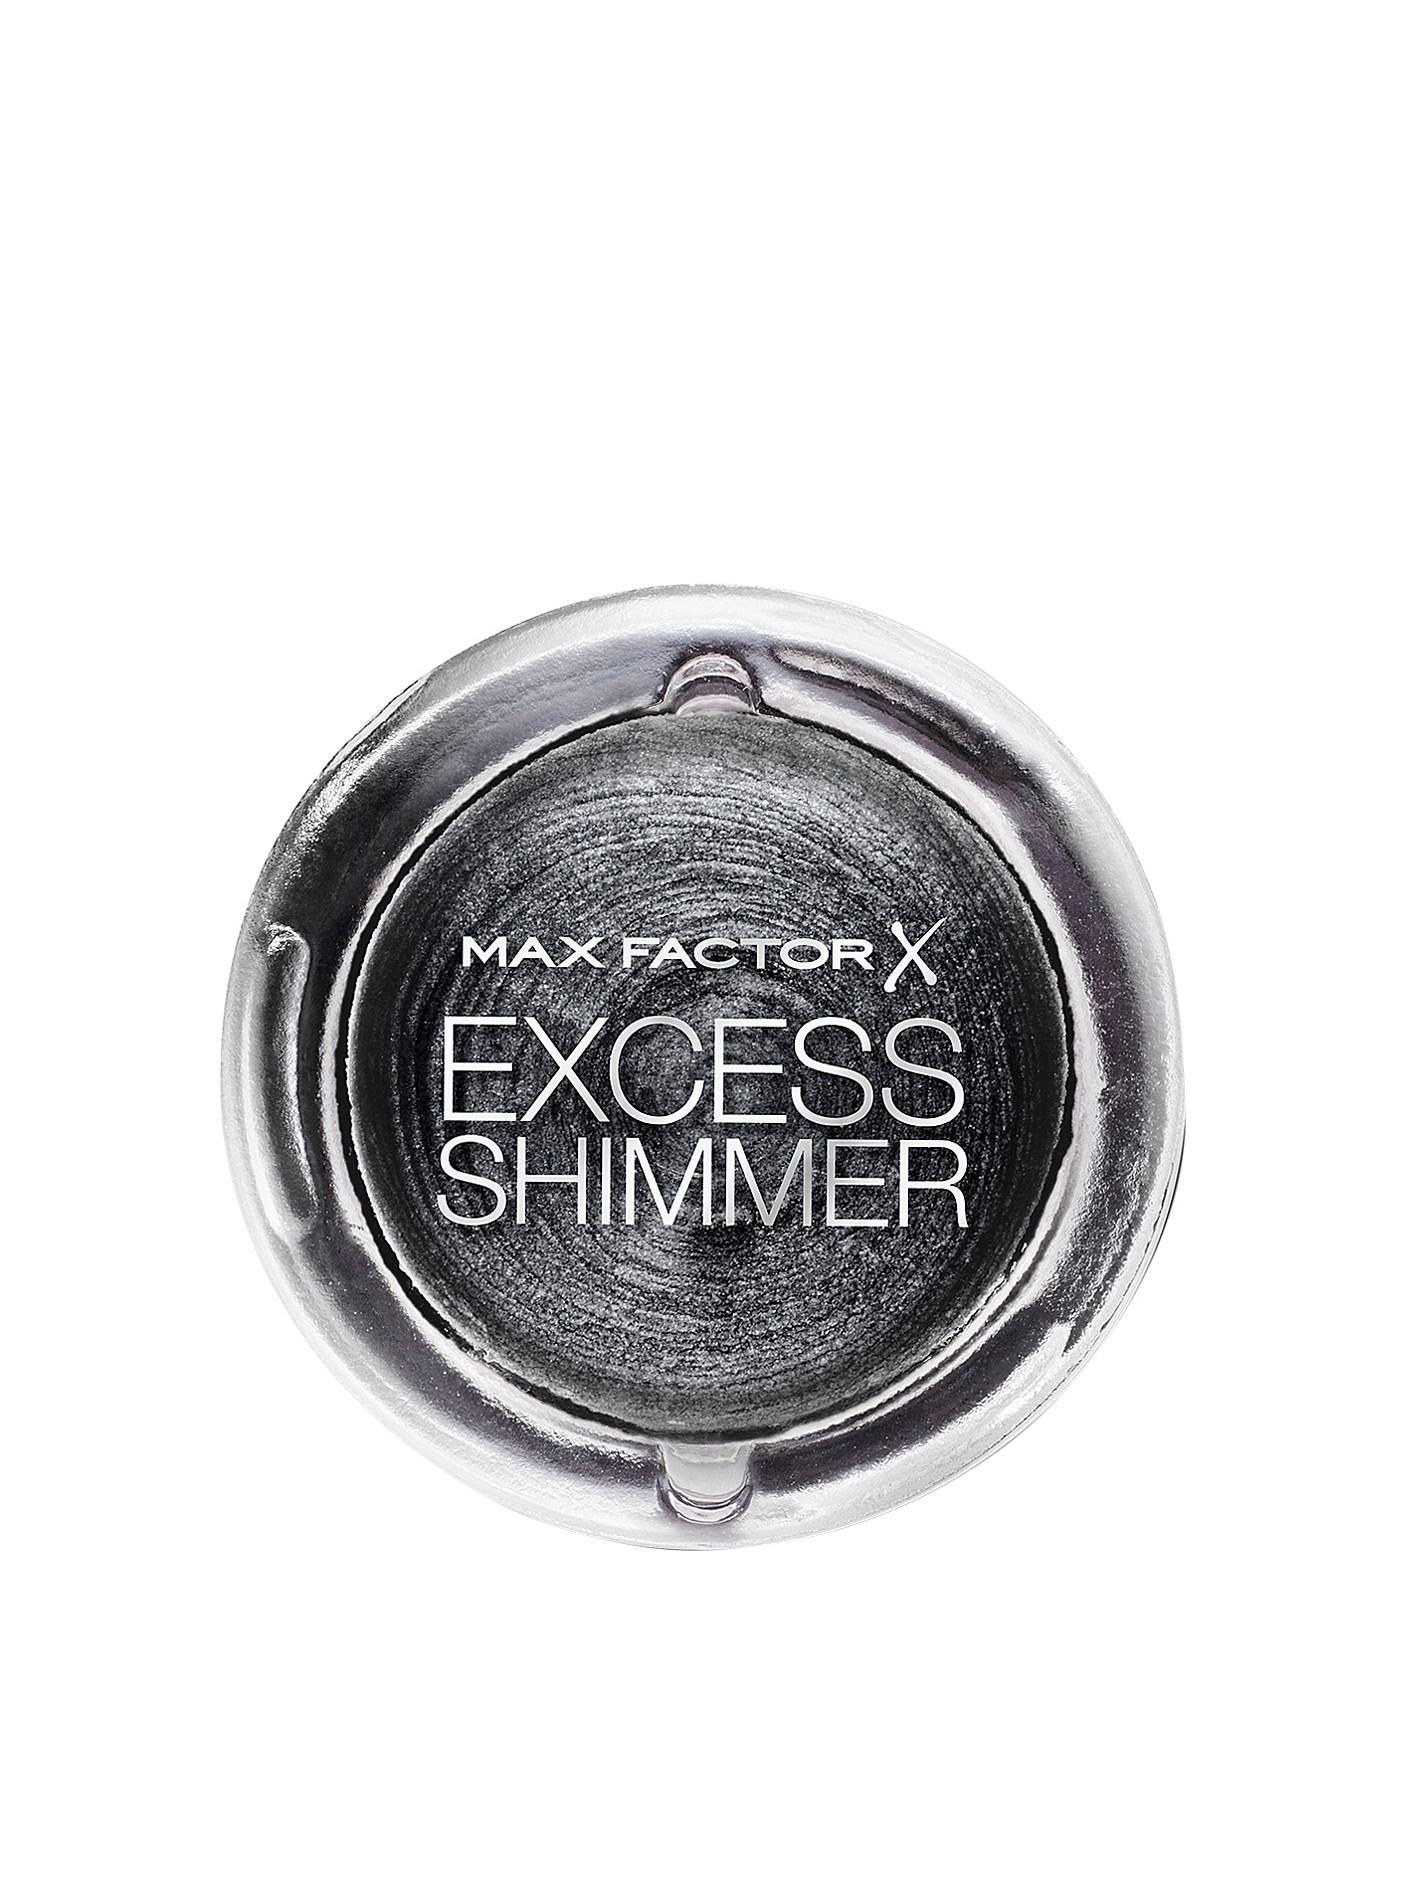 max factor excess shimmer 3.jpg